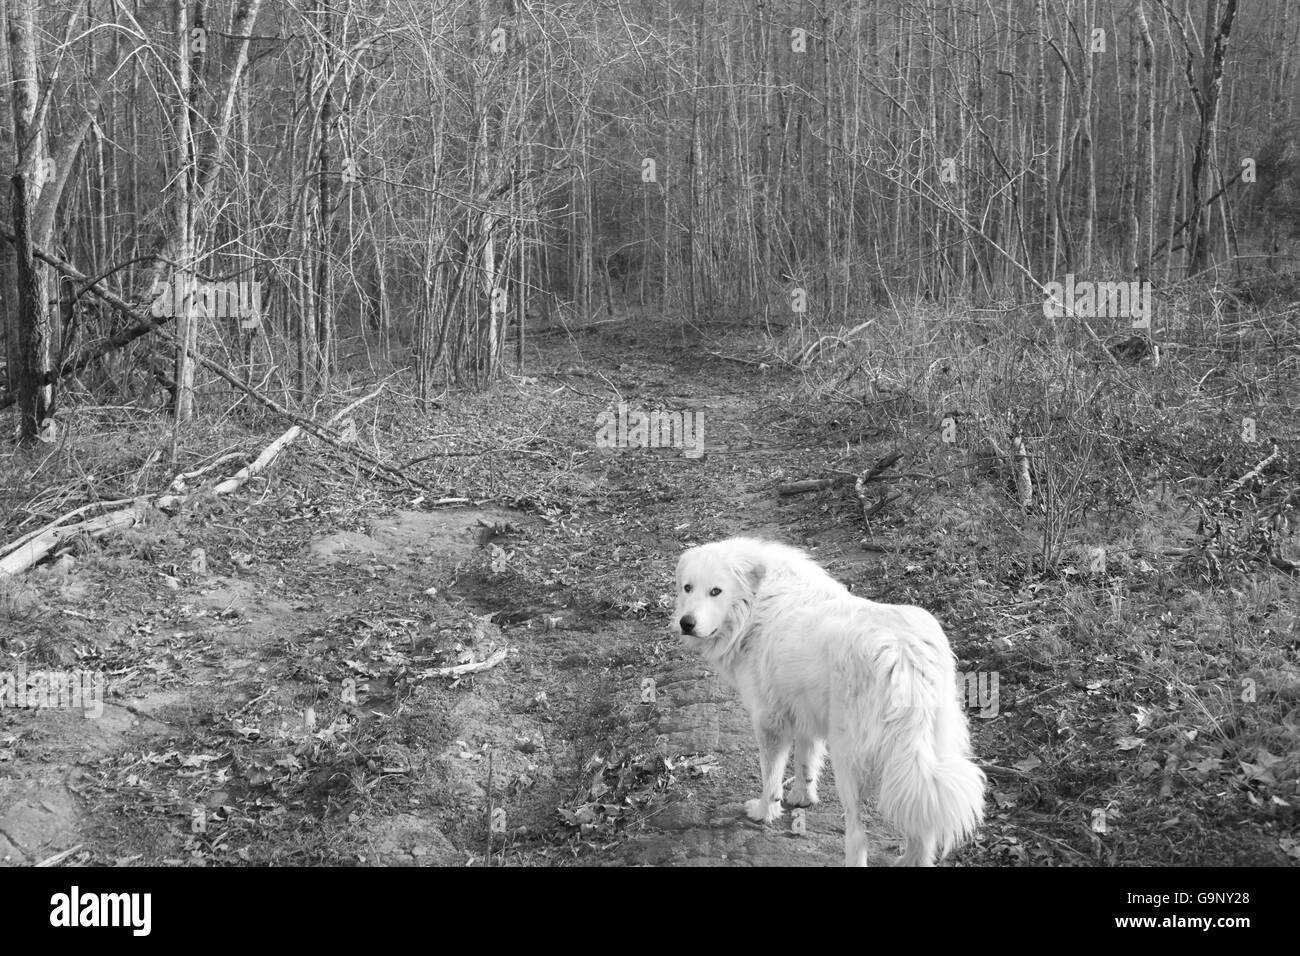 sad-dog-G9NY28.jpg